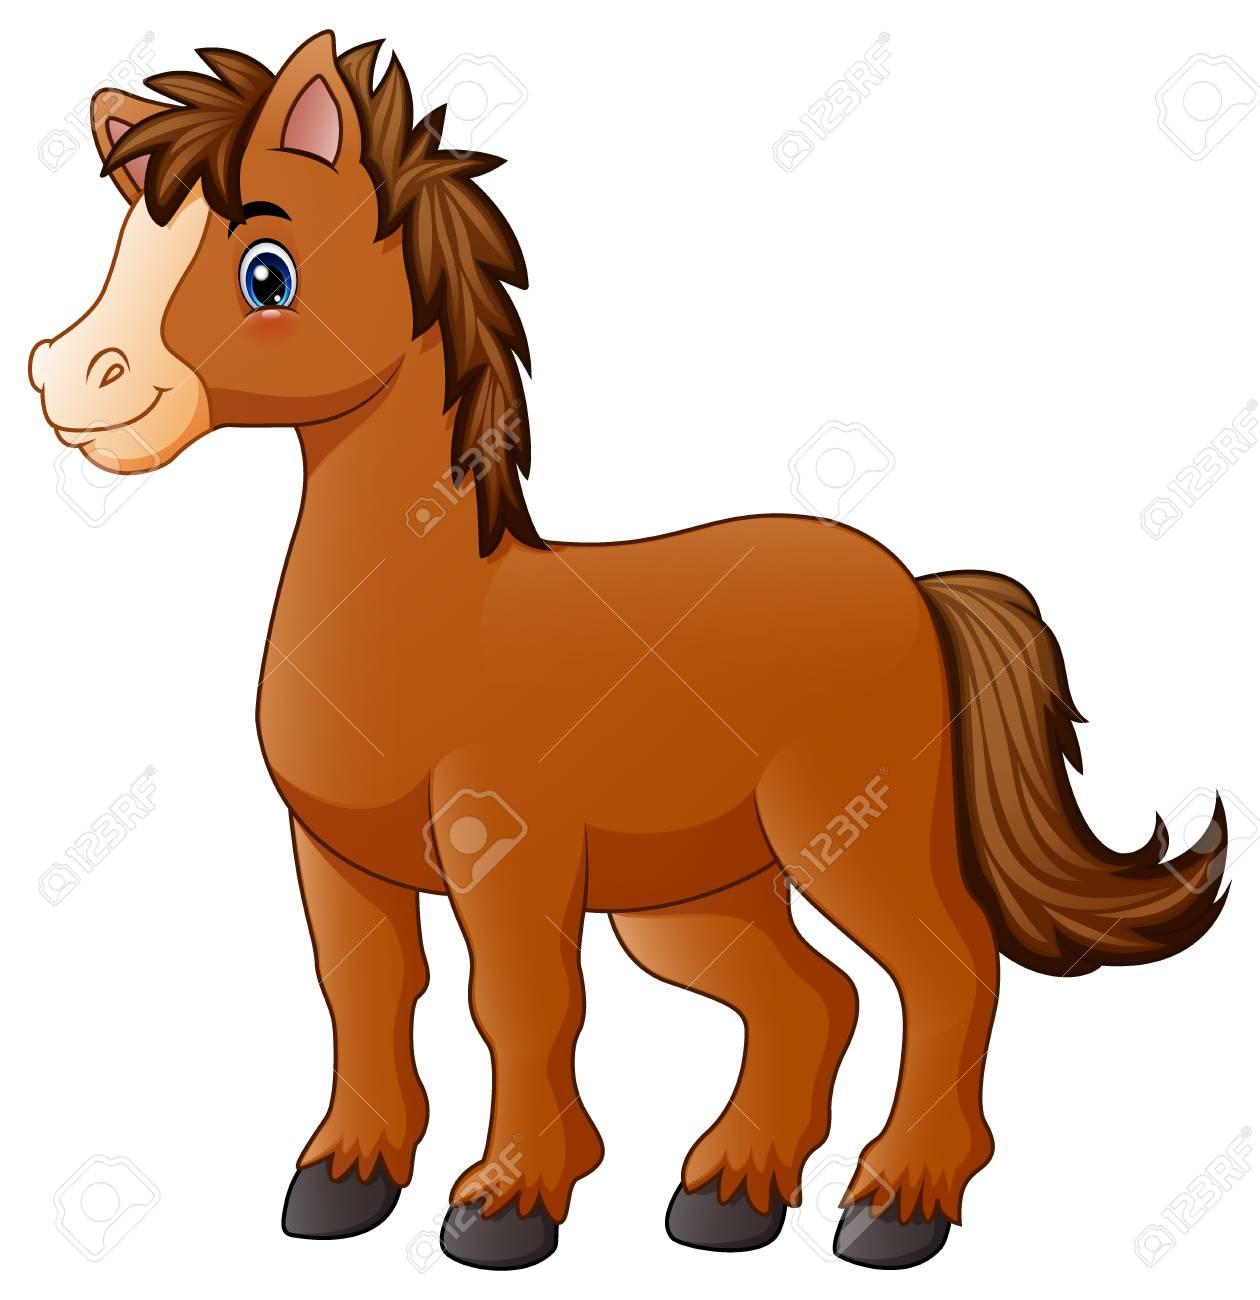 Vector illustration of brown horse cartoon royalty free cliparts vector vector illustration of brown horse cartoon publicscrutiny Choice Image